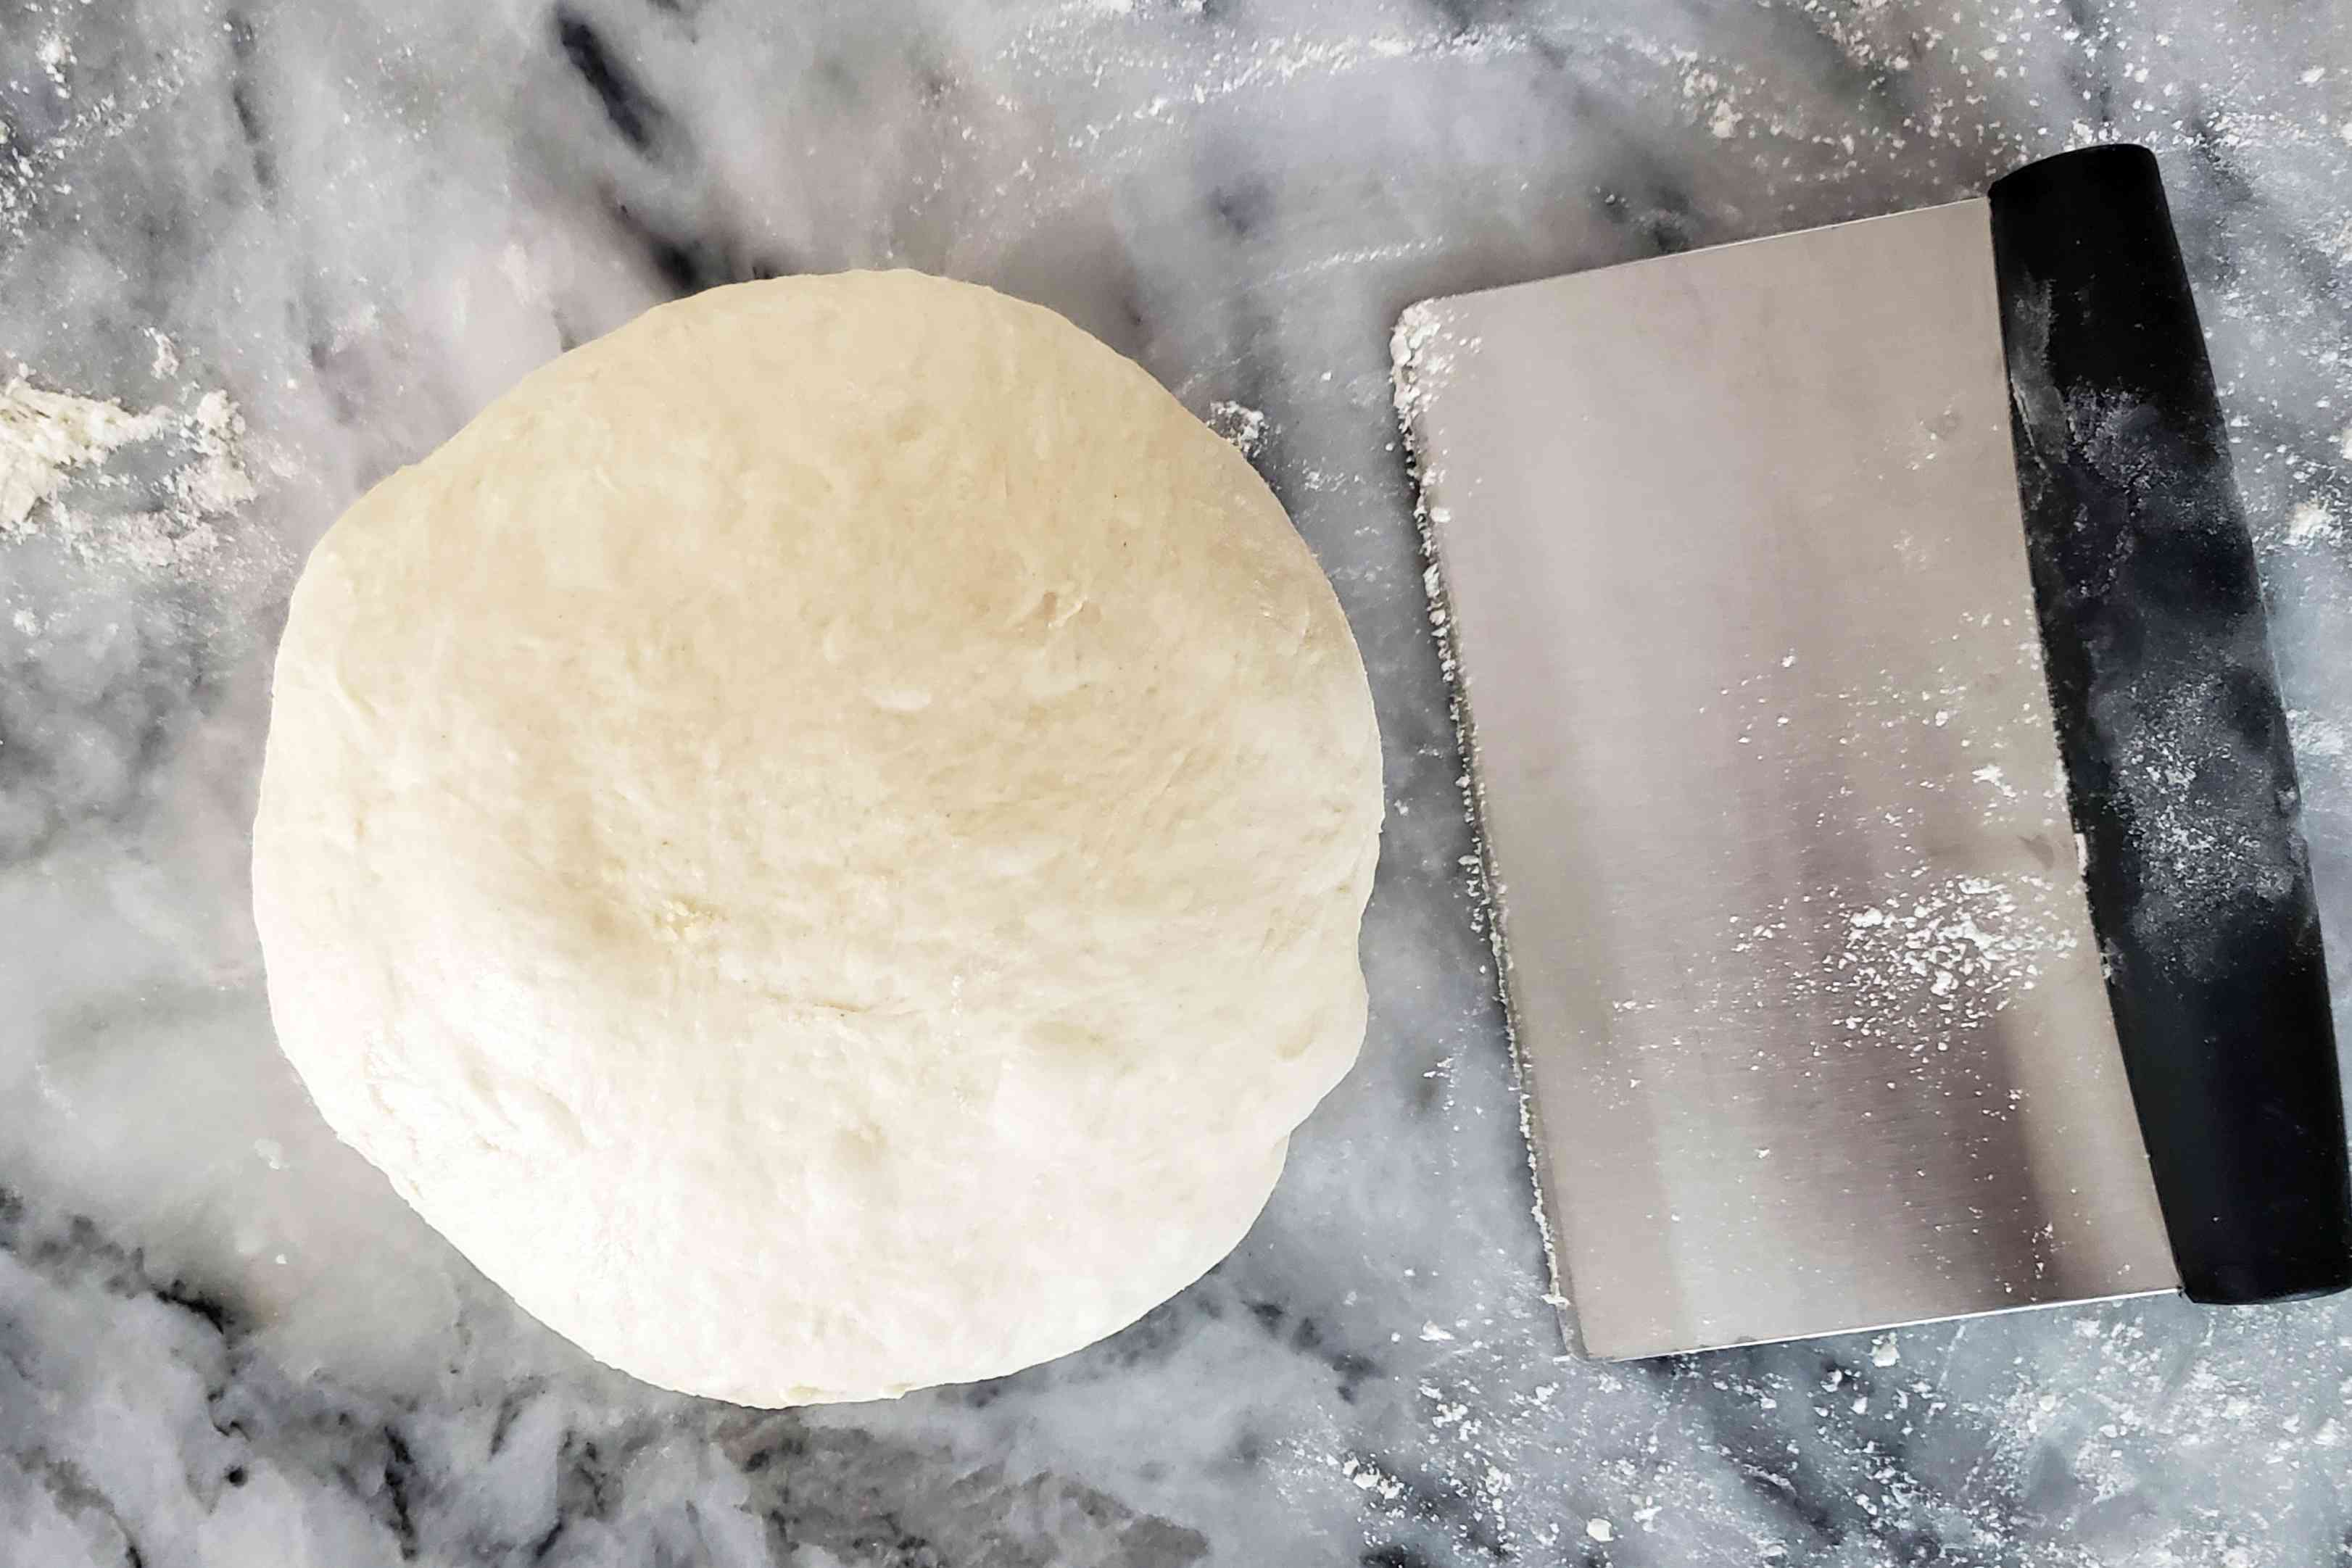 Shaping the bread dough for no-knead bread